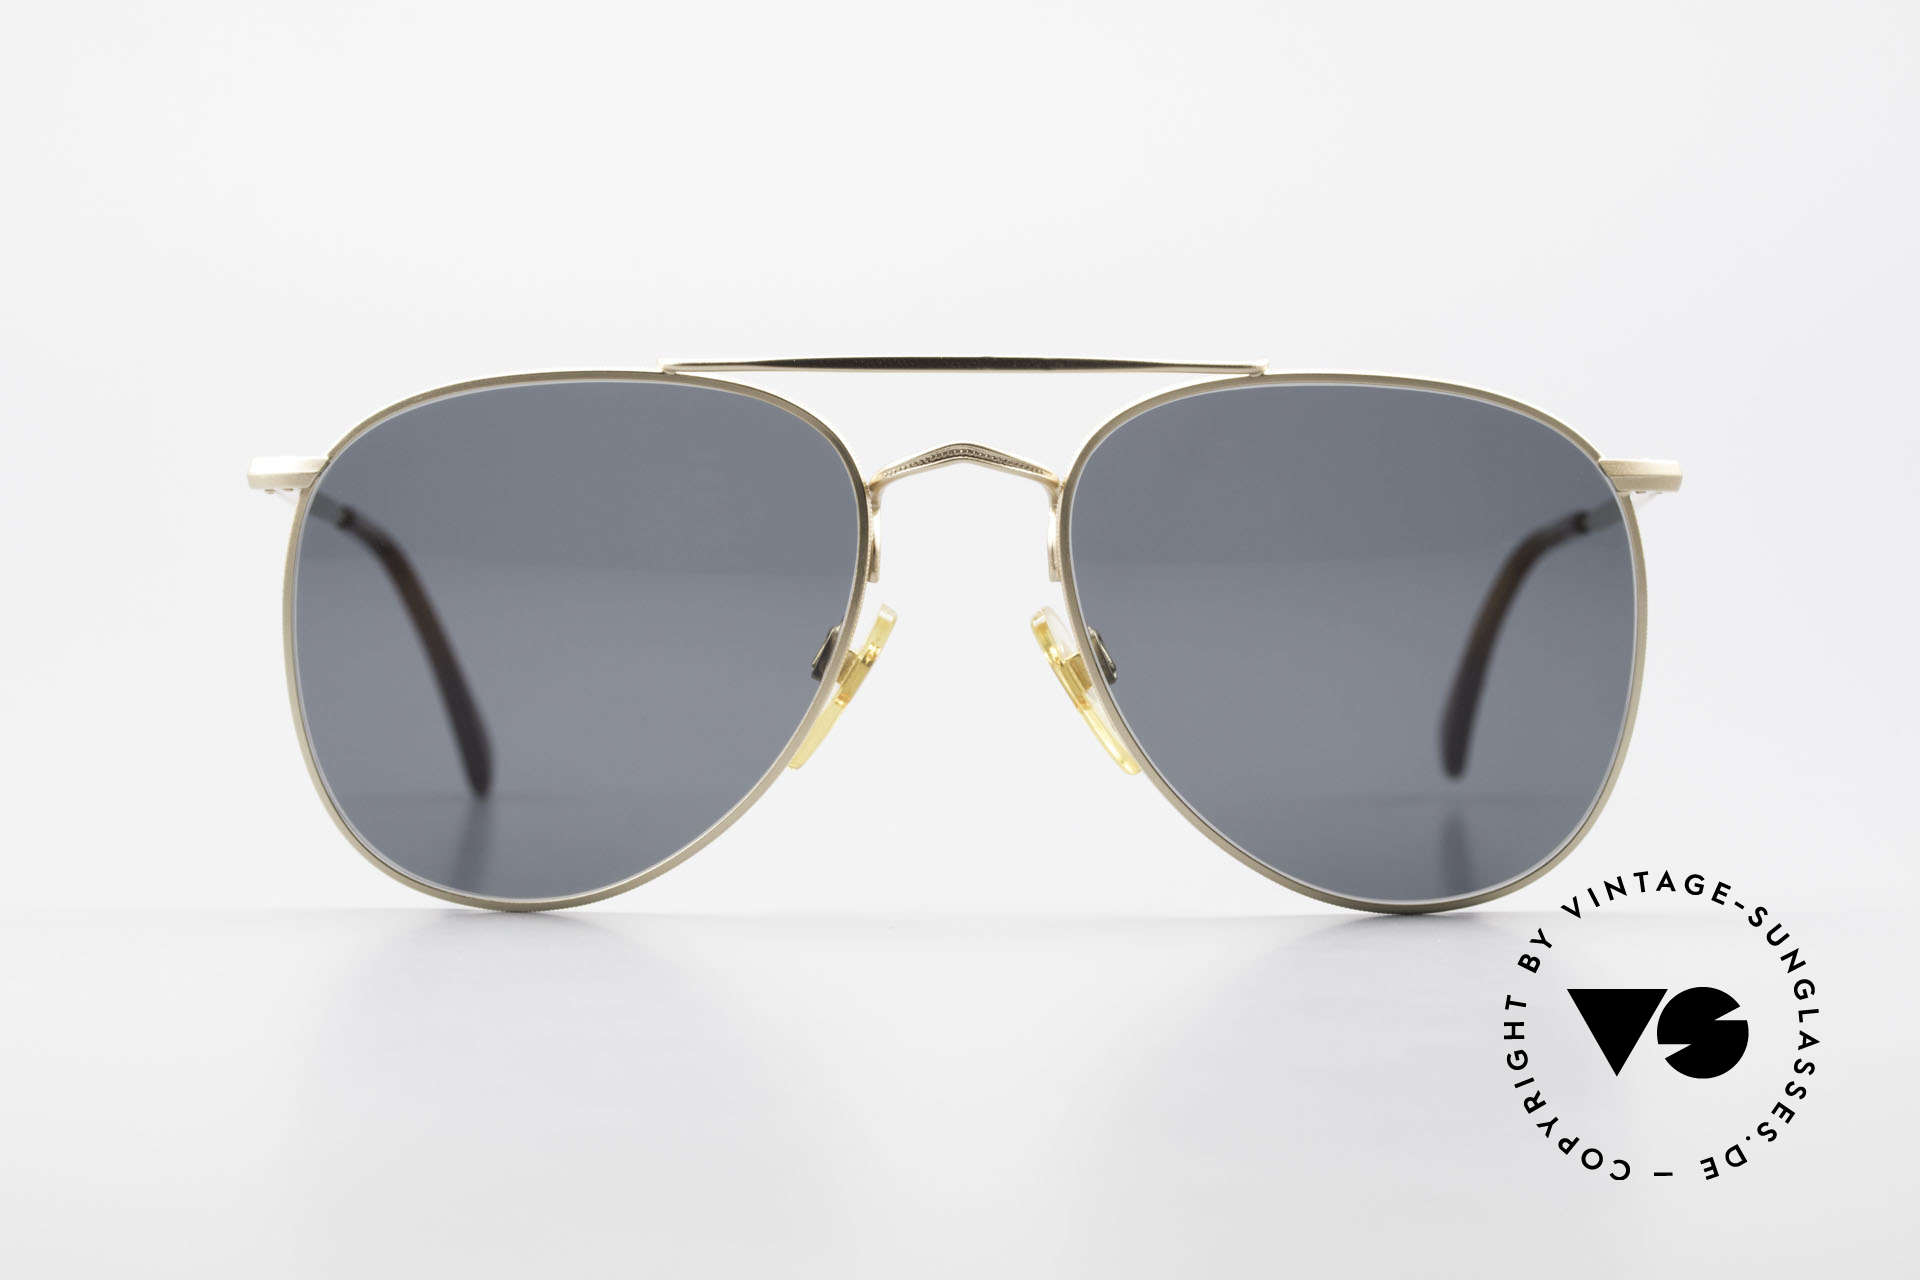 Giorgio Armani 149 Small 90'S Aviator Sunglasses, vintage shades by the fashion designer G.Armani, Made for Men and Women